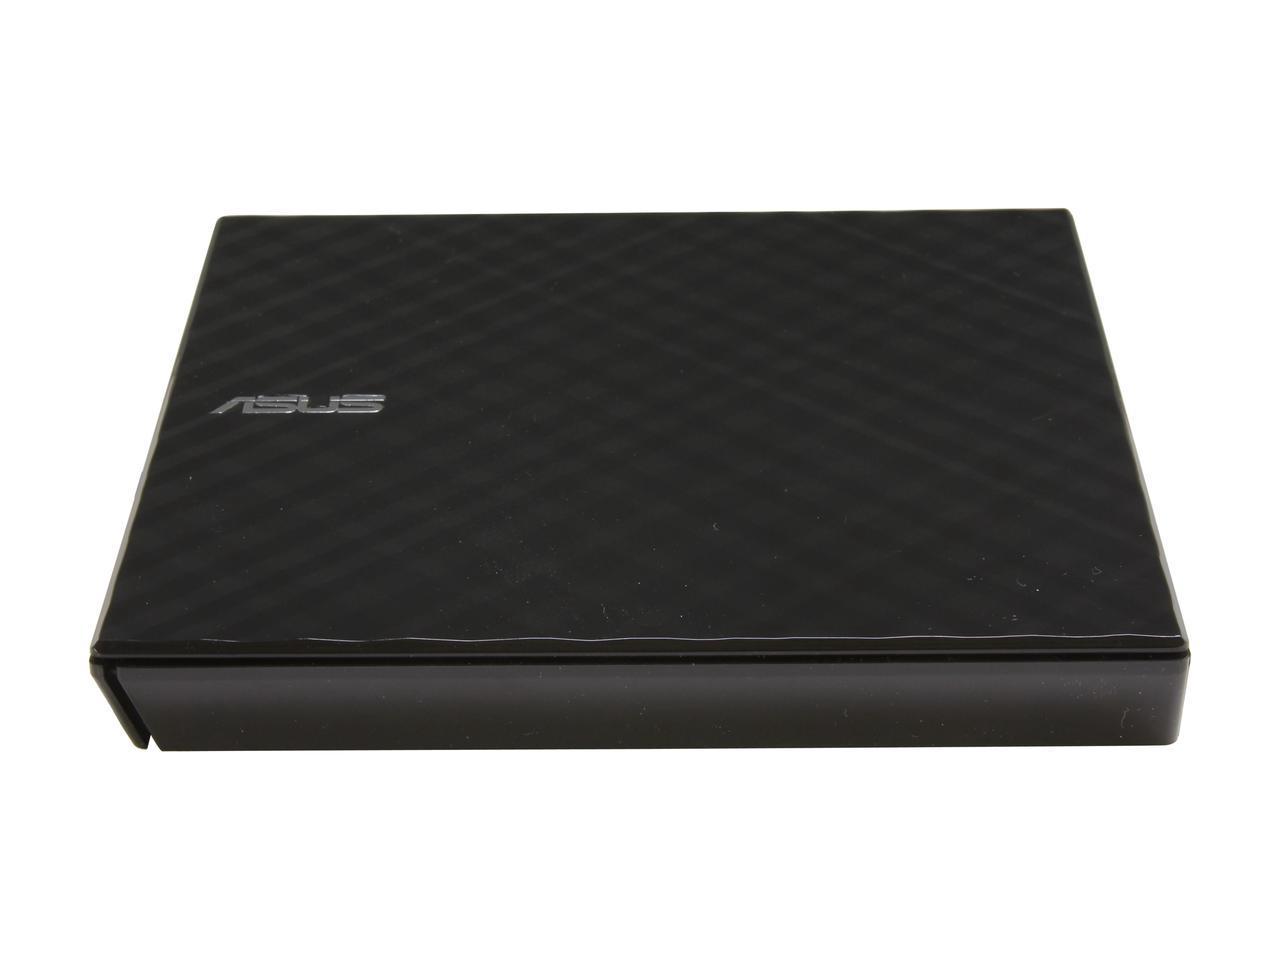 Asus 8x USB 2.0 Black Portable External Slim CD/DVD Re-writer (SDRW-08D2S-U) for $10.99 AR + S&H @ Newegg